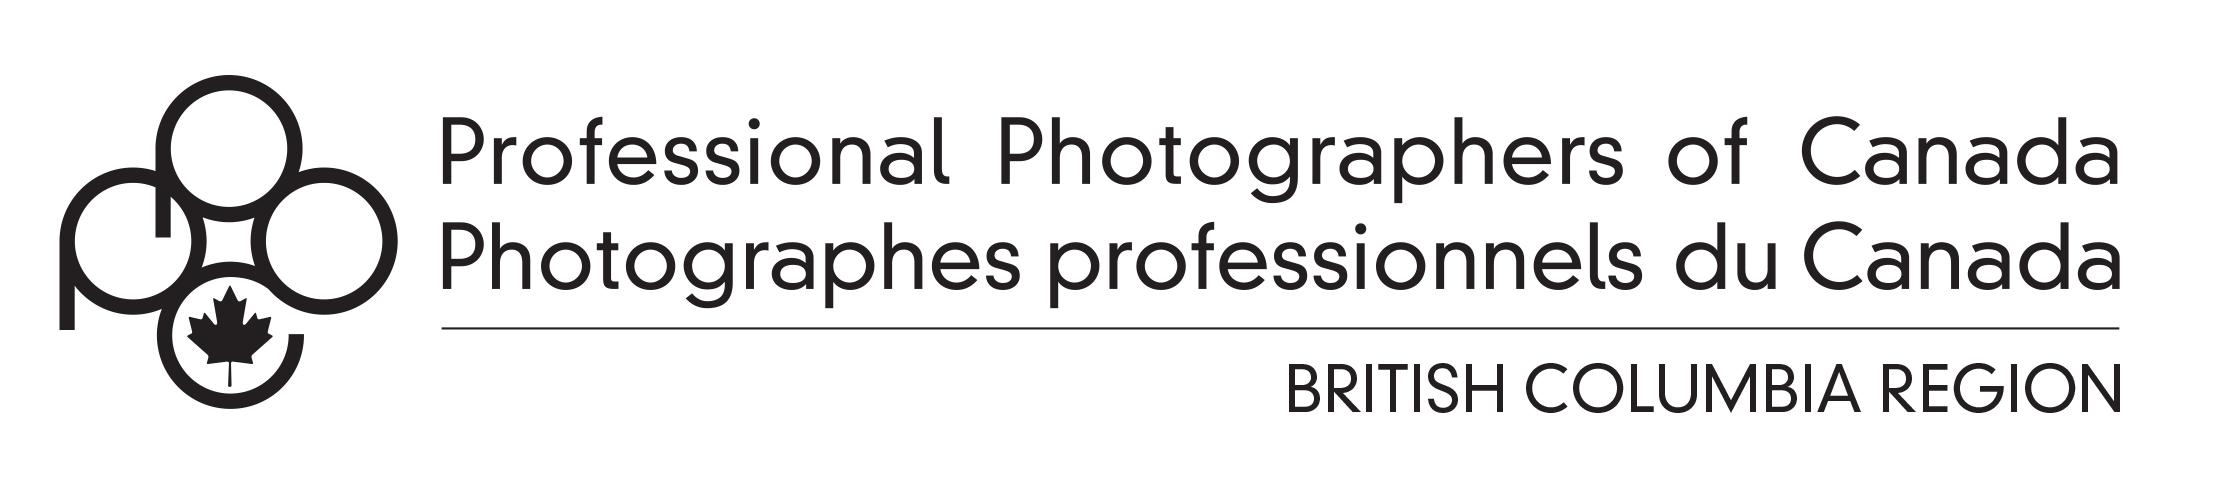 PPOC_BC_Logo